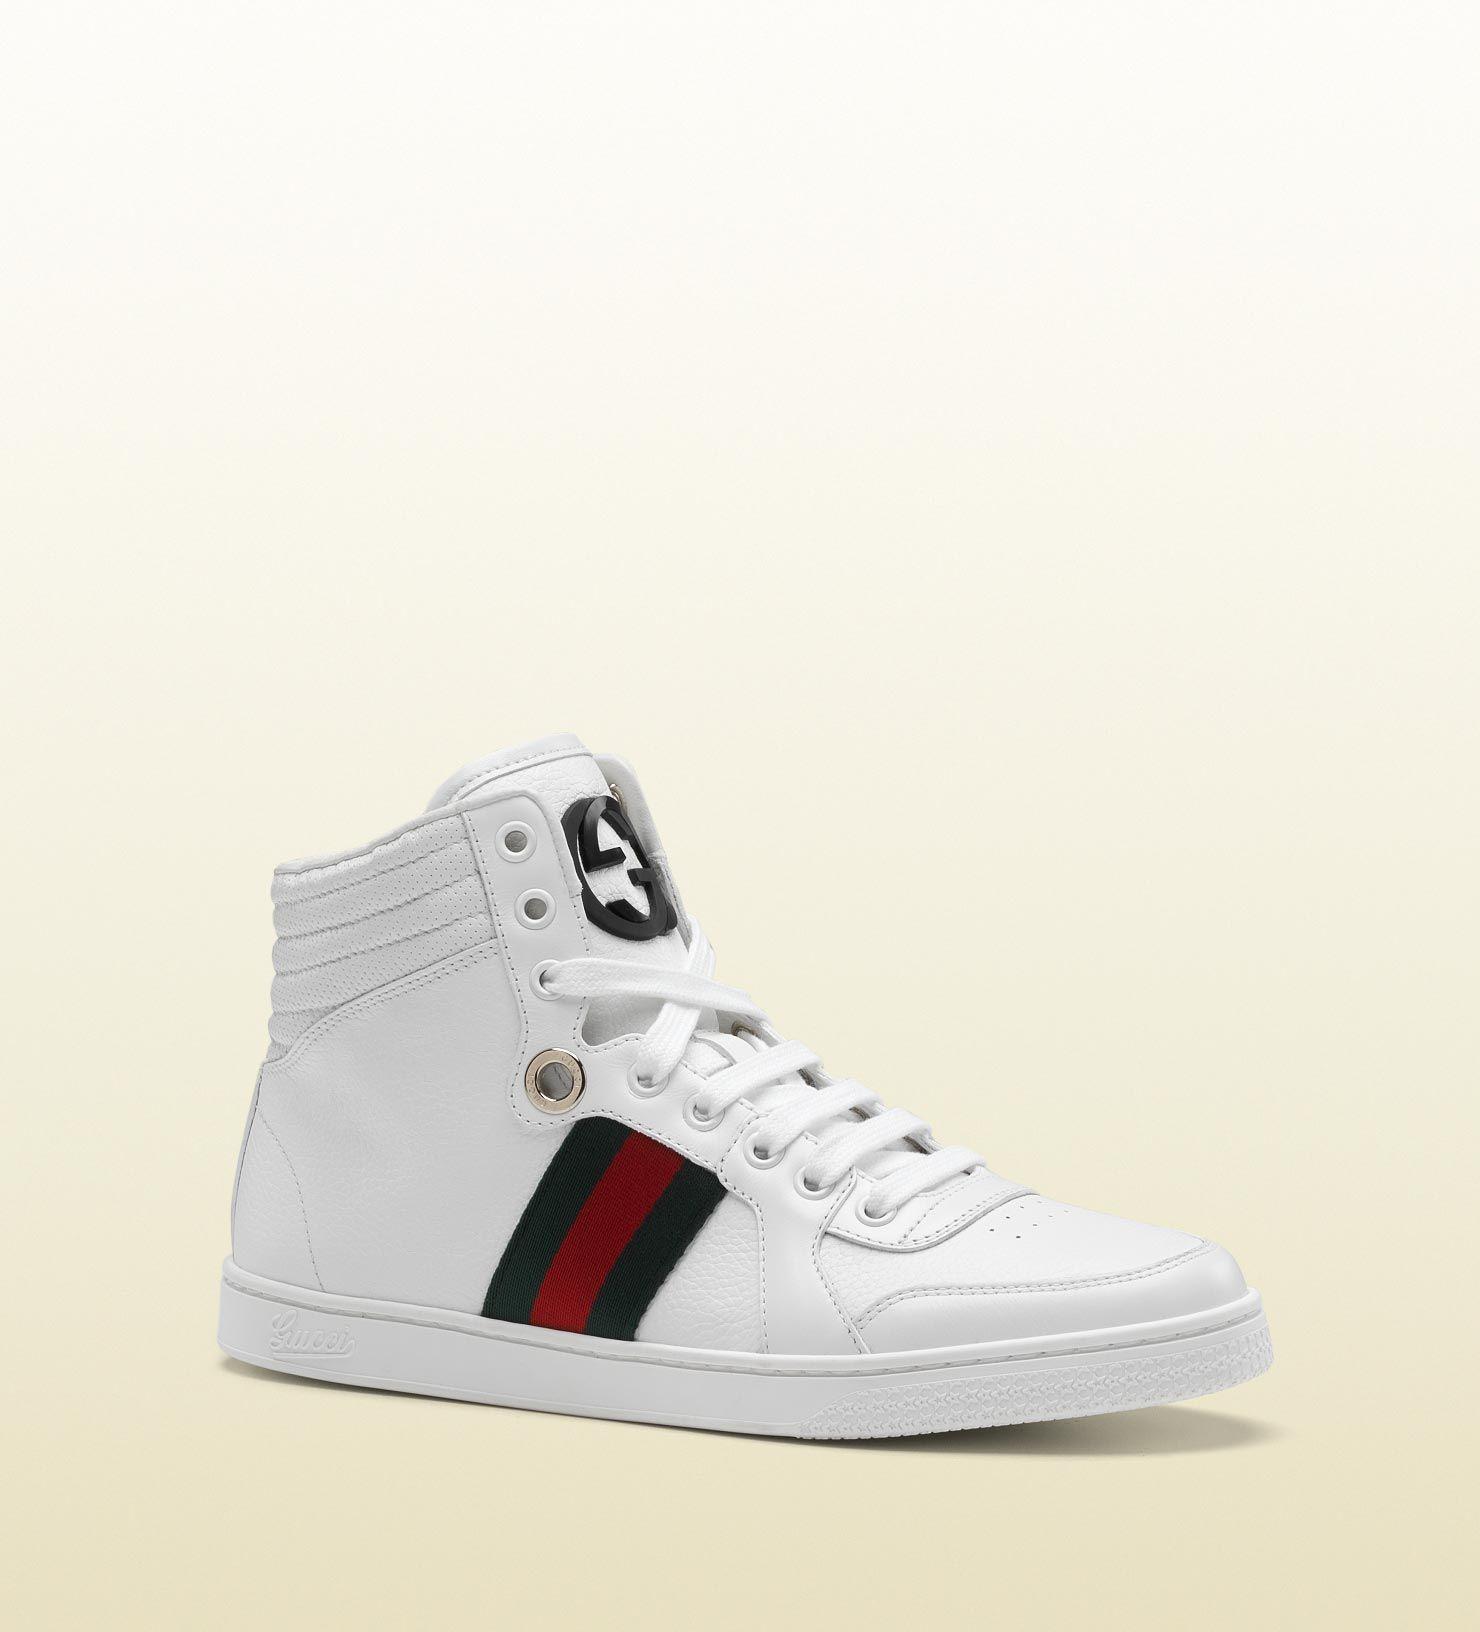 coda hi-top sneaker with interlocking G